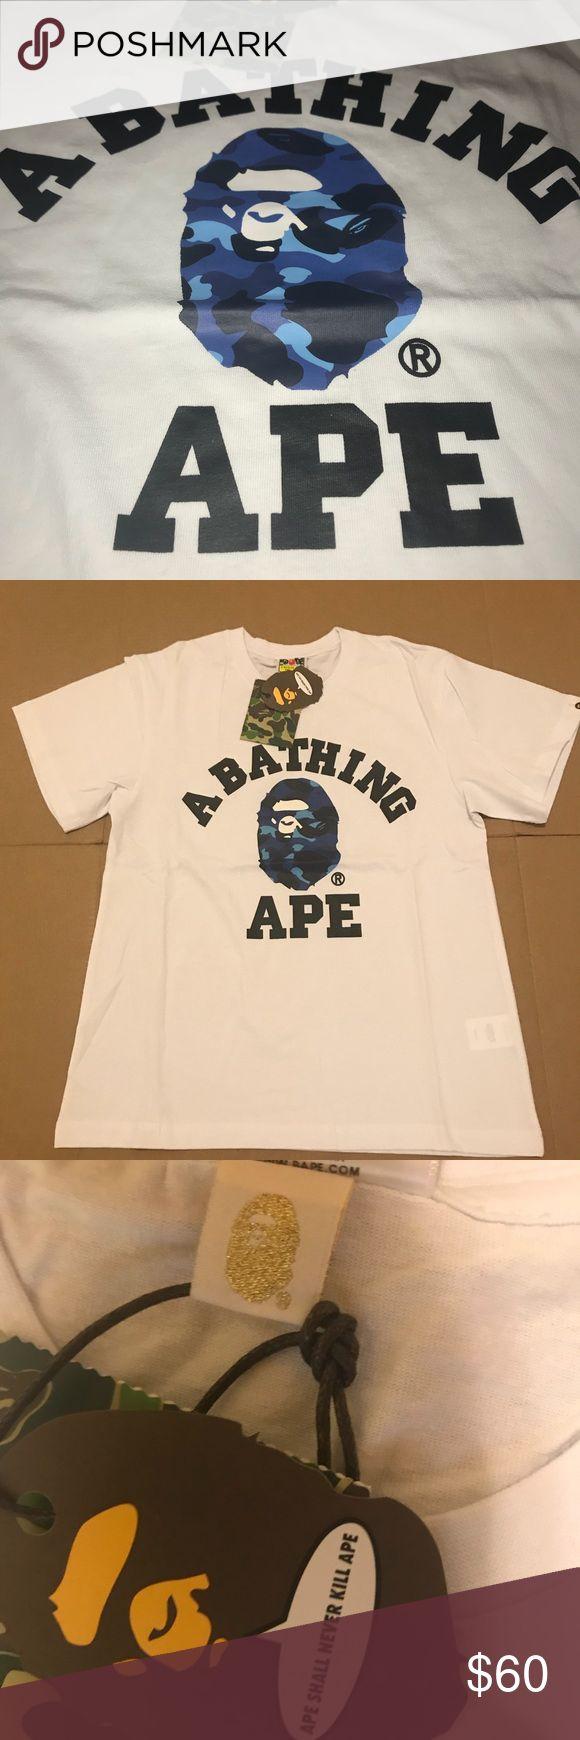 A Bathing Ape t Shirt White blue ape Sz xL Bape Shirt bape Shirts Tees - Short Sleeve